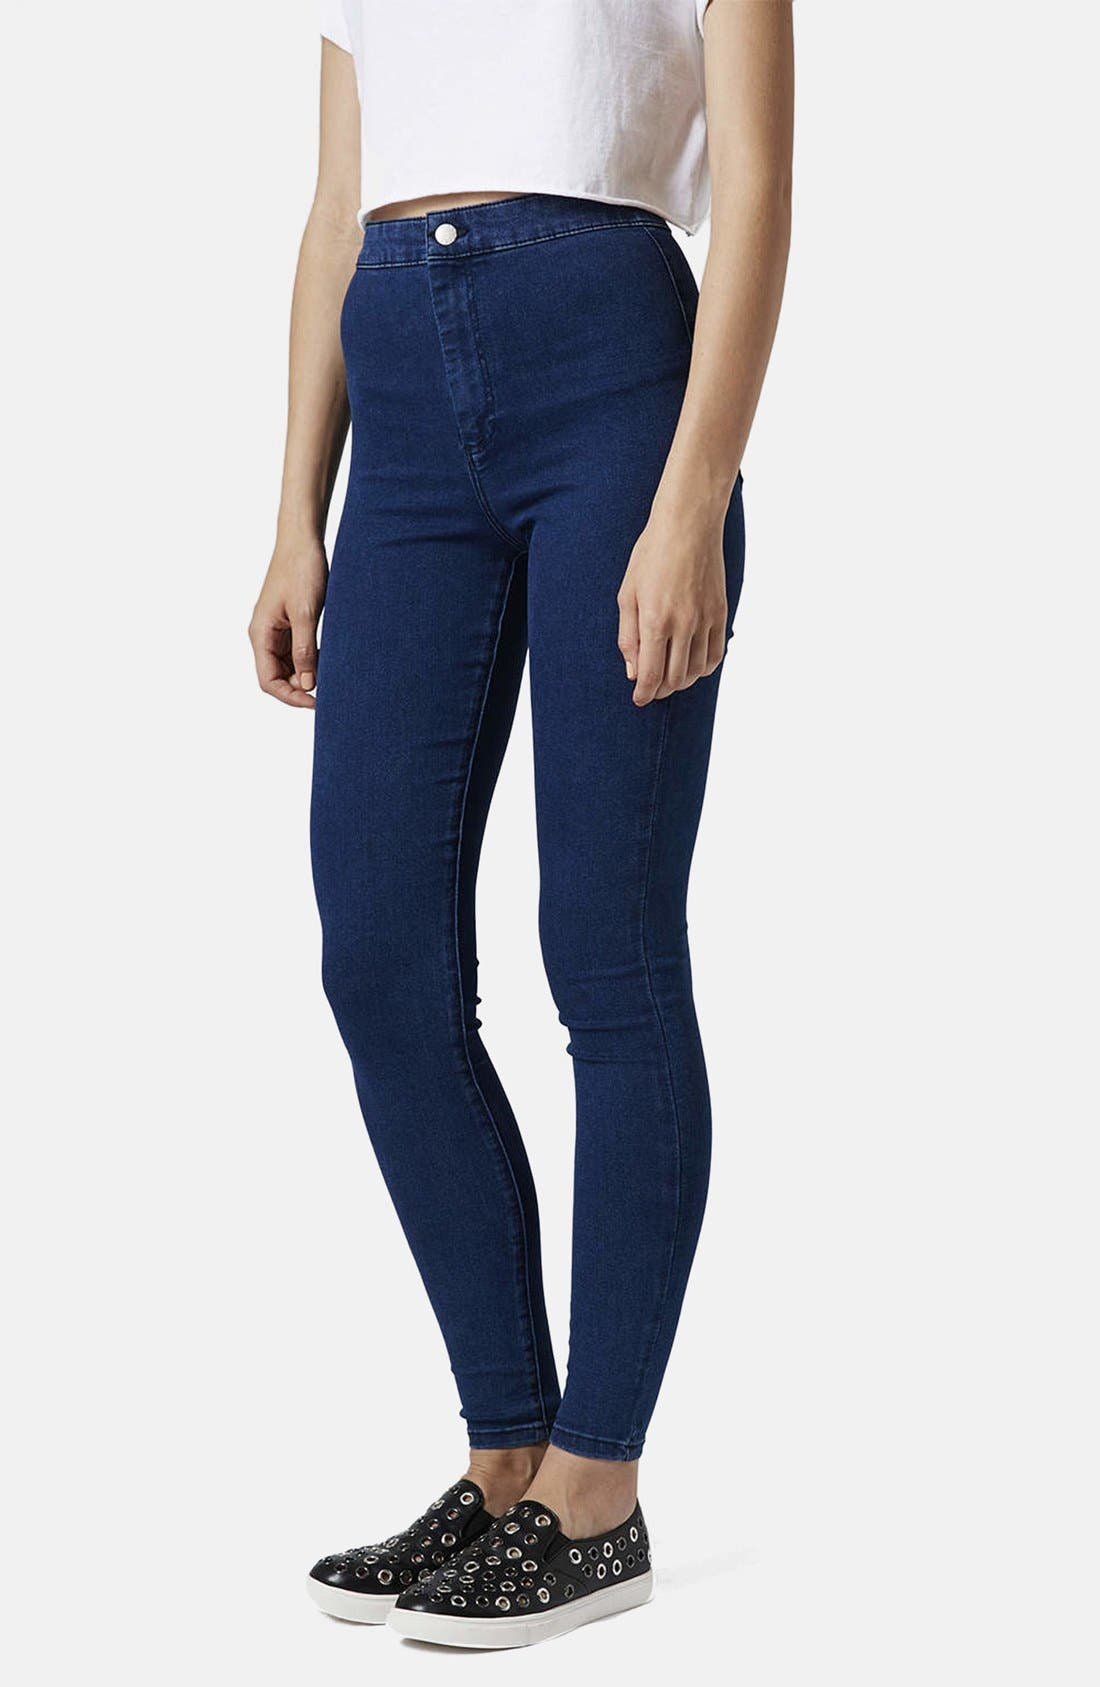 Alternate Image 1 Selected - Topshop Moto 'Joni' Skinny Jeans (Dark Stone) (Short)